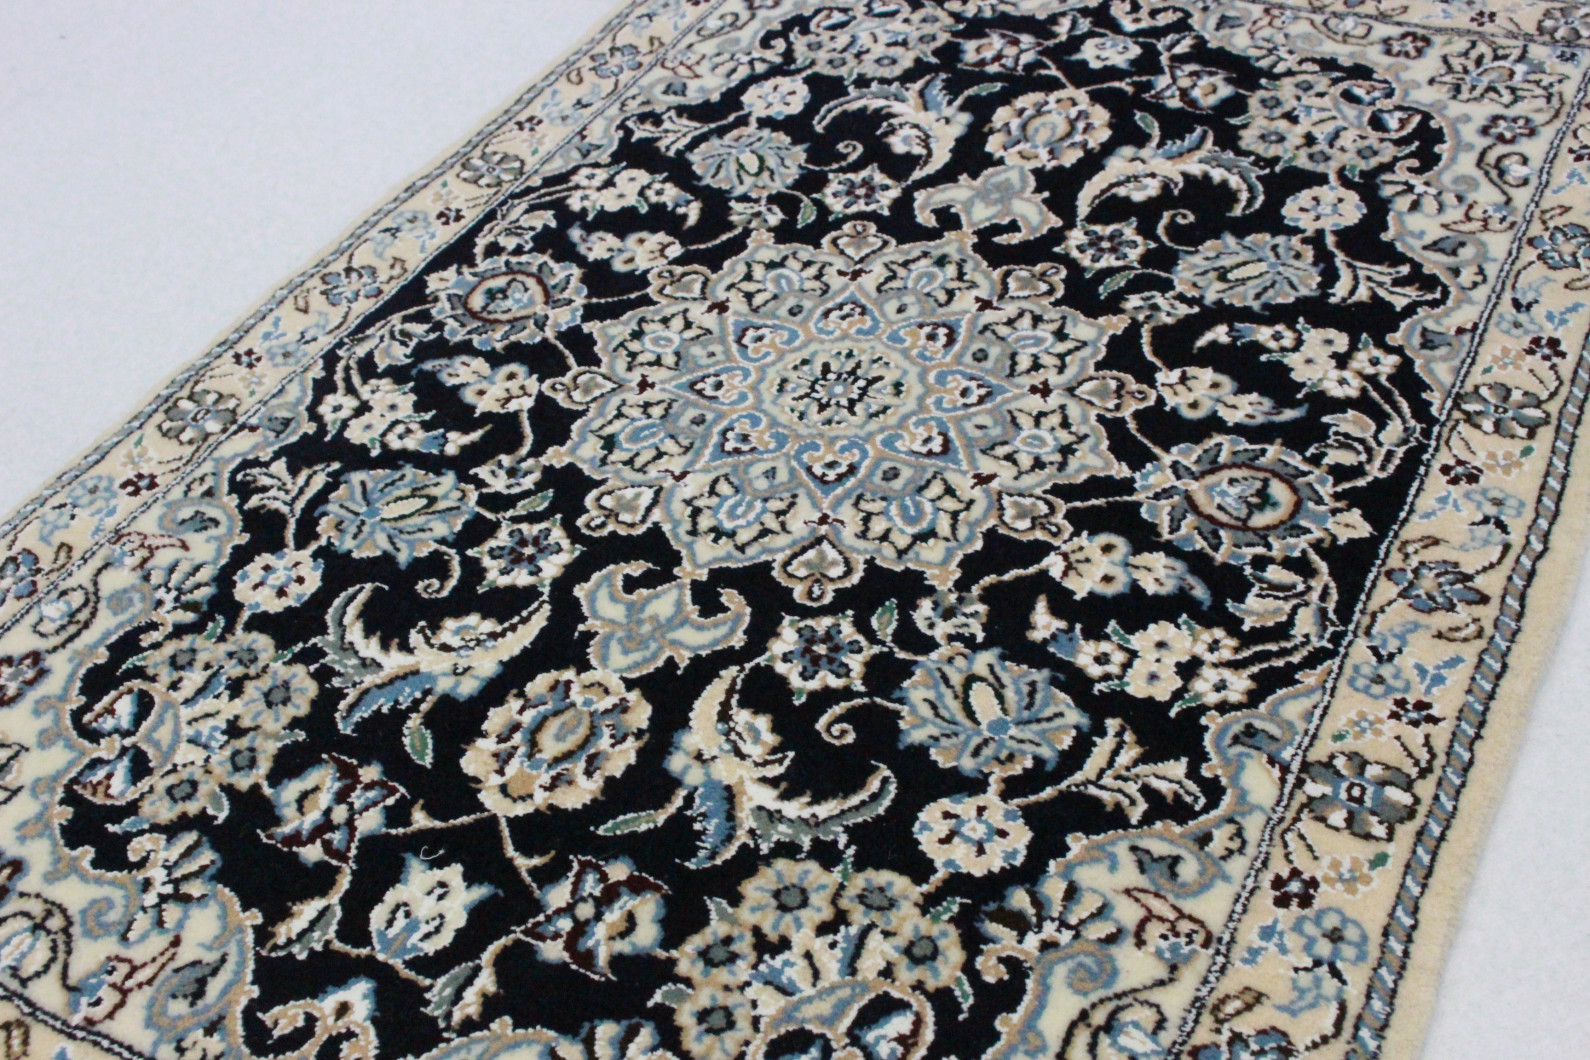 Nain teppich  Nain Teppich Beige Blau in 100x60 (5120-27436) bei carpetido.de kaufen